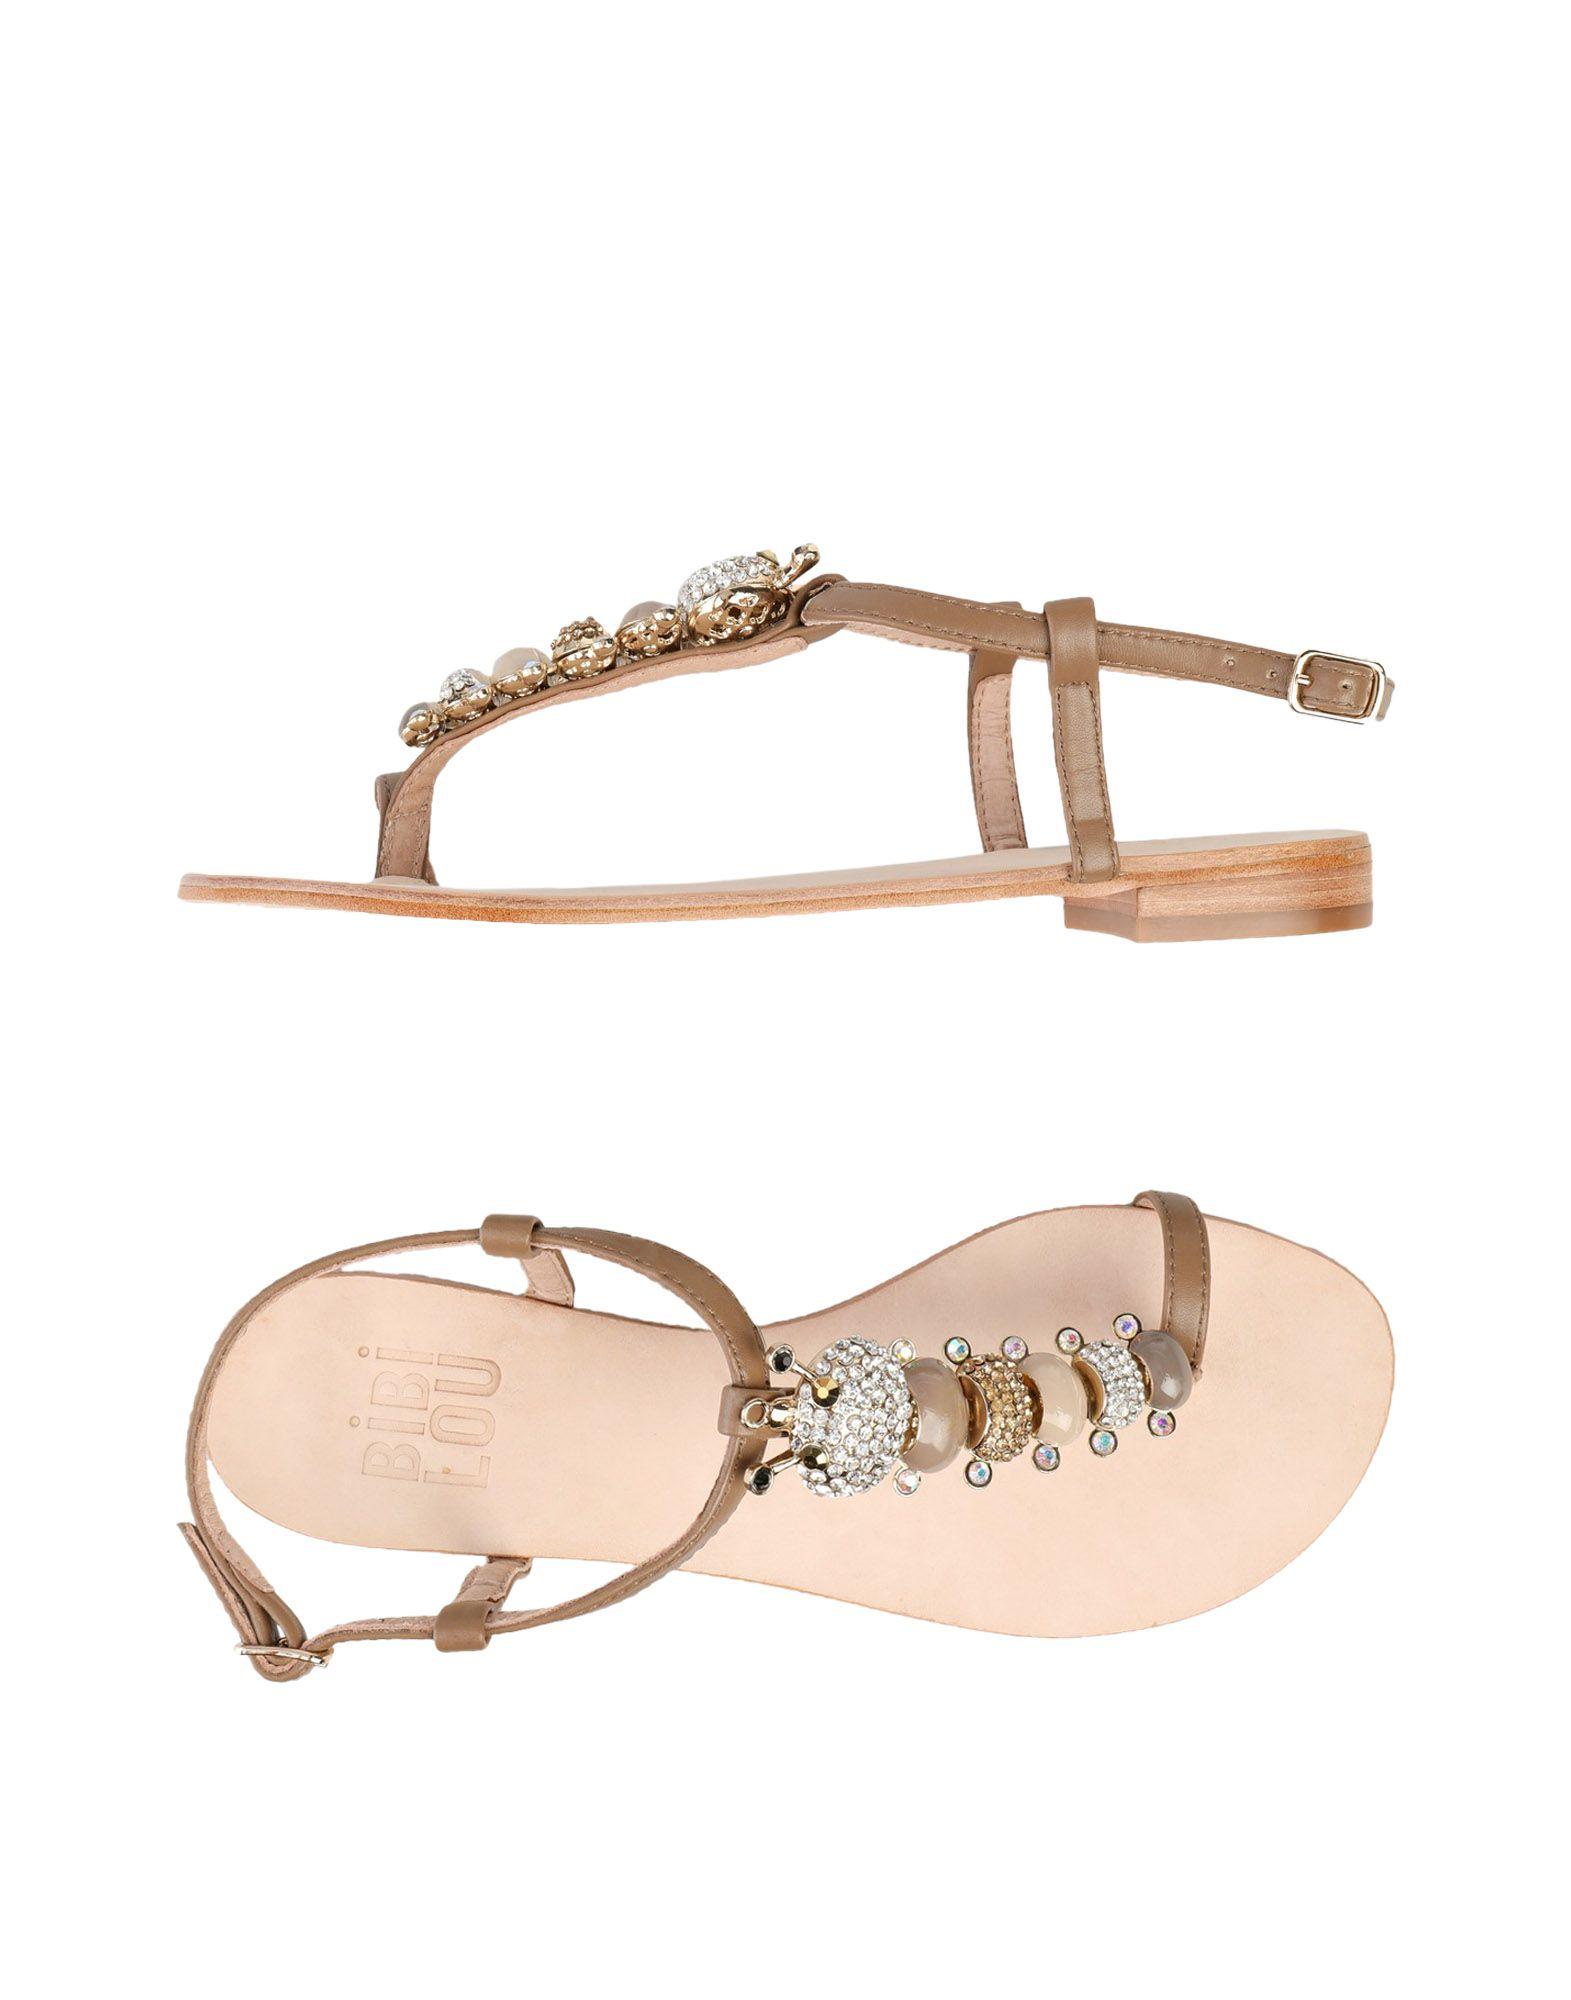 Bibi Lou Dianetten Damen  11343144CA Gute Qualität beliebte Schuhe